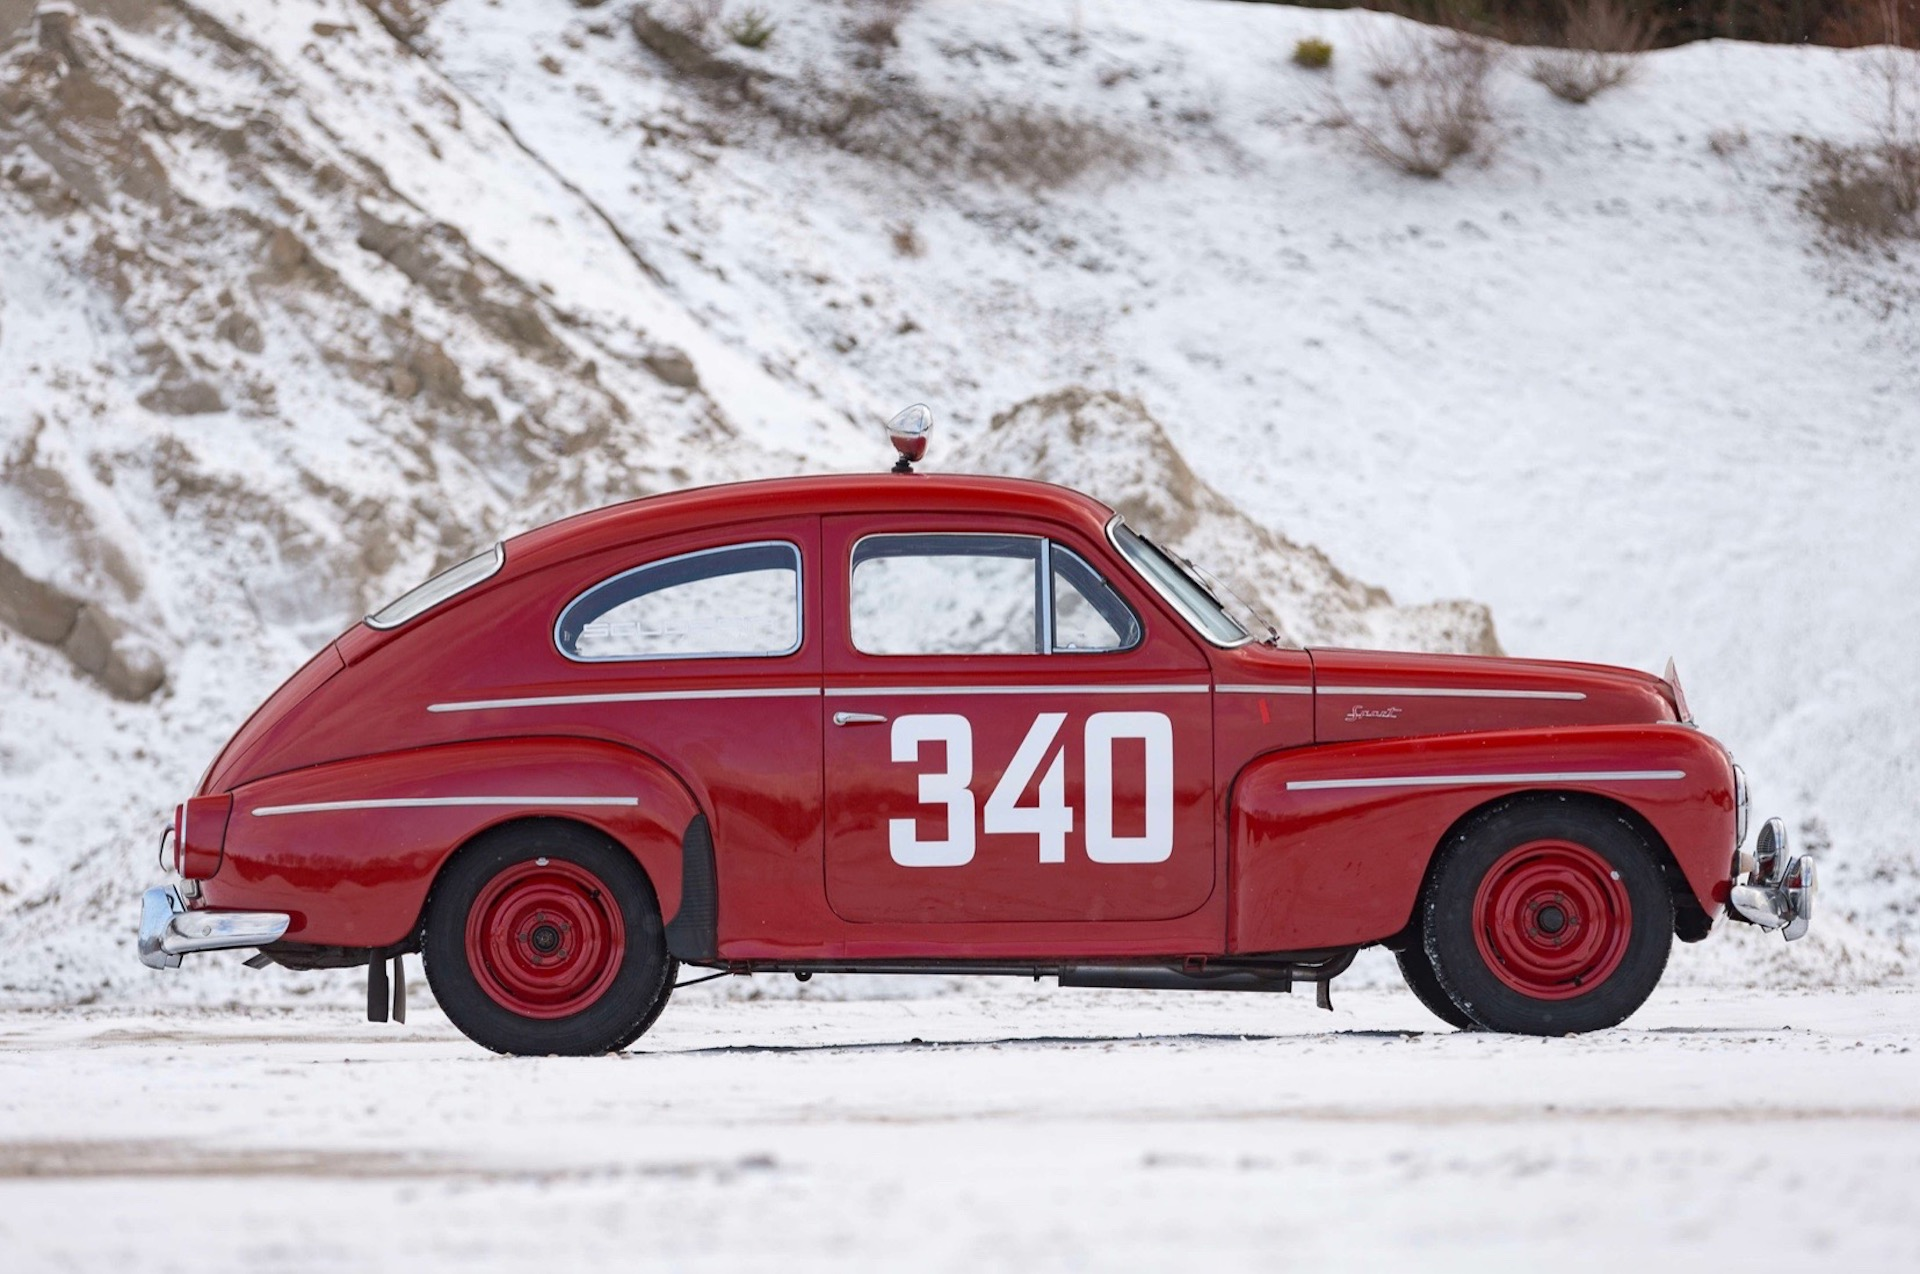 Volvo PV544 Monte – 2